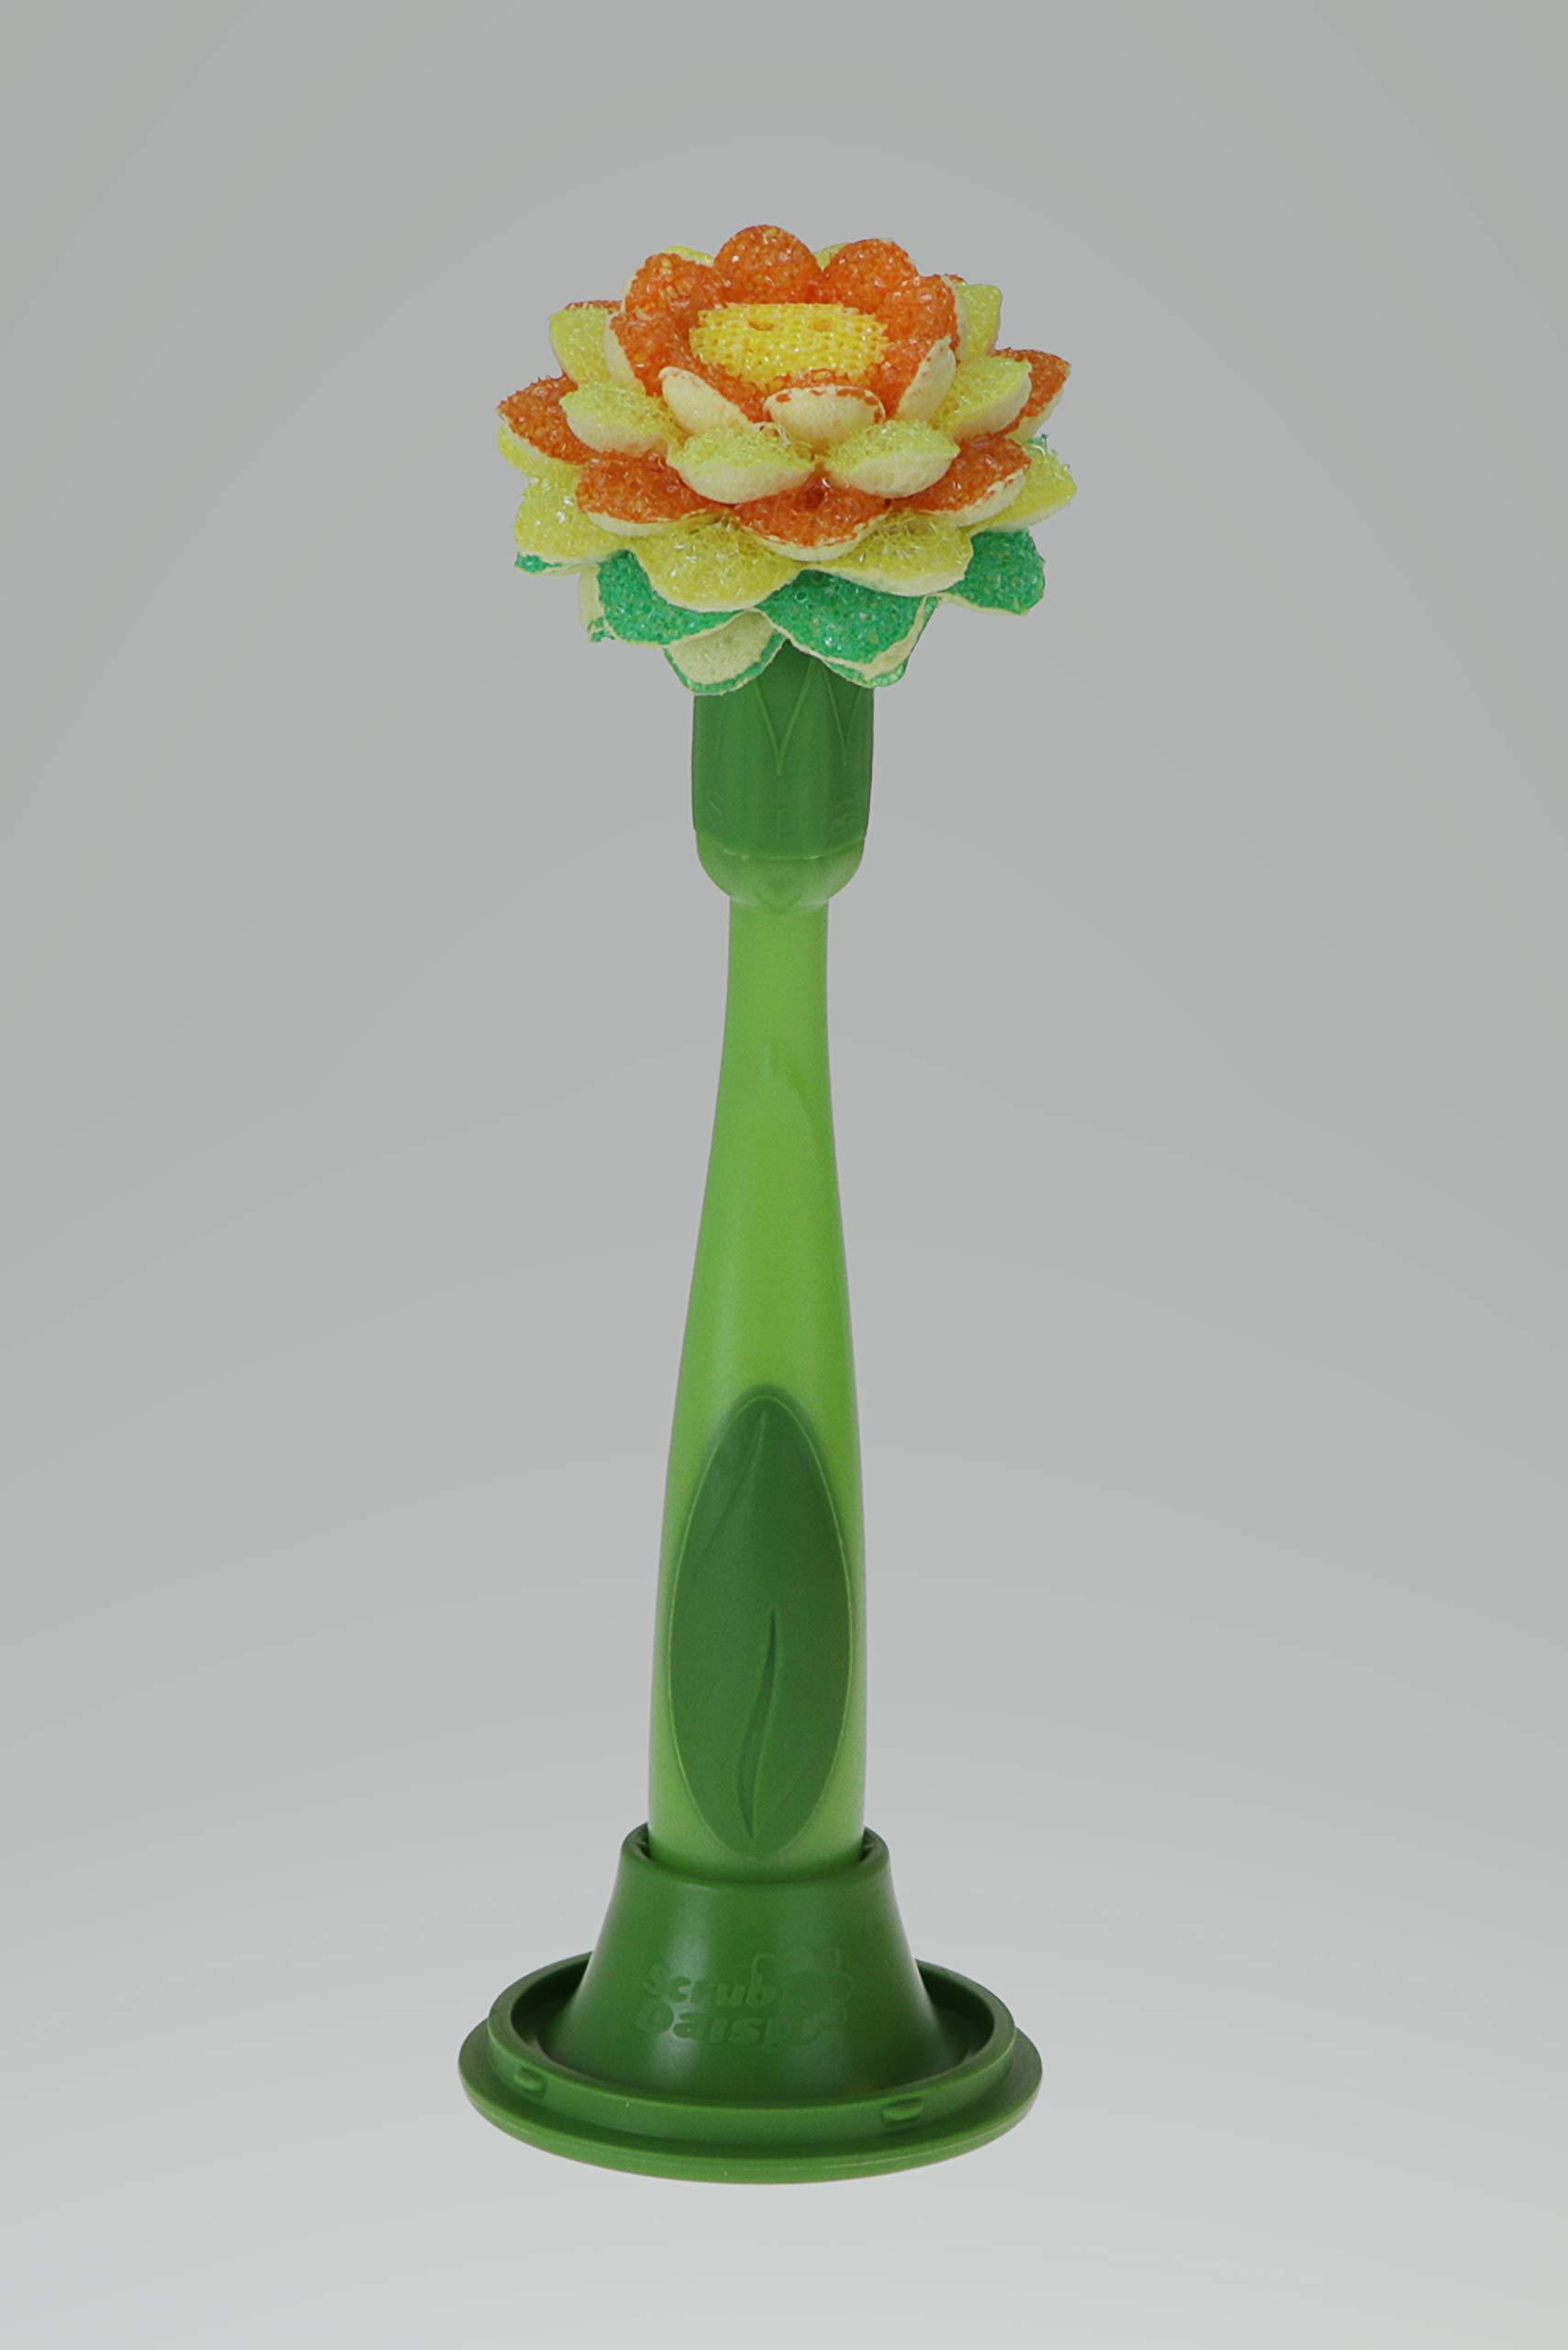 Scrub Daisy 3-Piece Dish Wand Set with Daisy Head, Set includes: Daisy Head for Multi-purpose Scrubbing, Ergonomic Soap Dispensing Handle, Self-draining Storage Vase